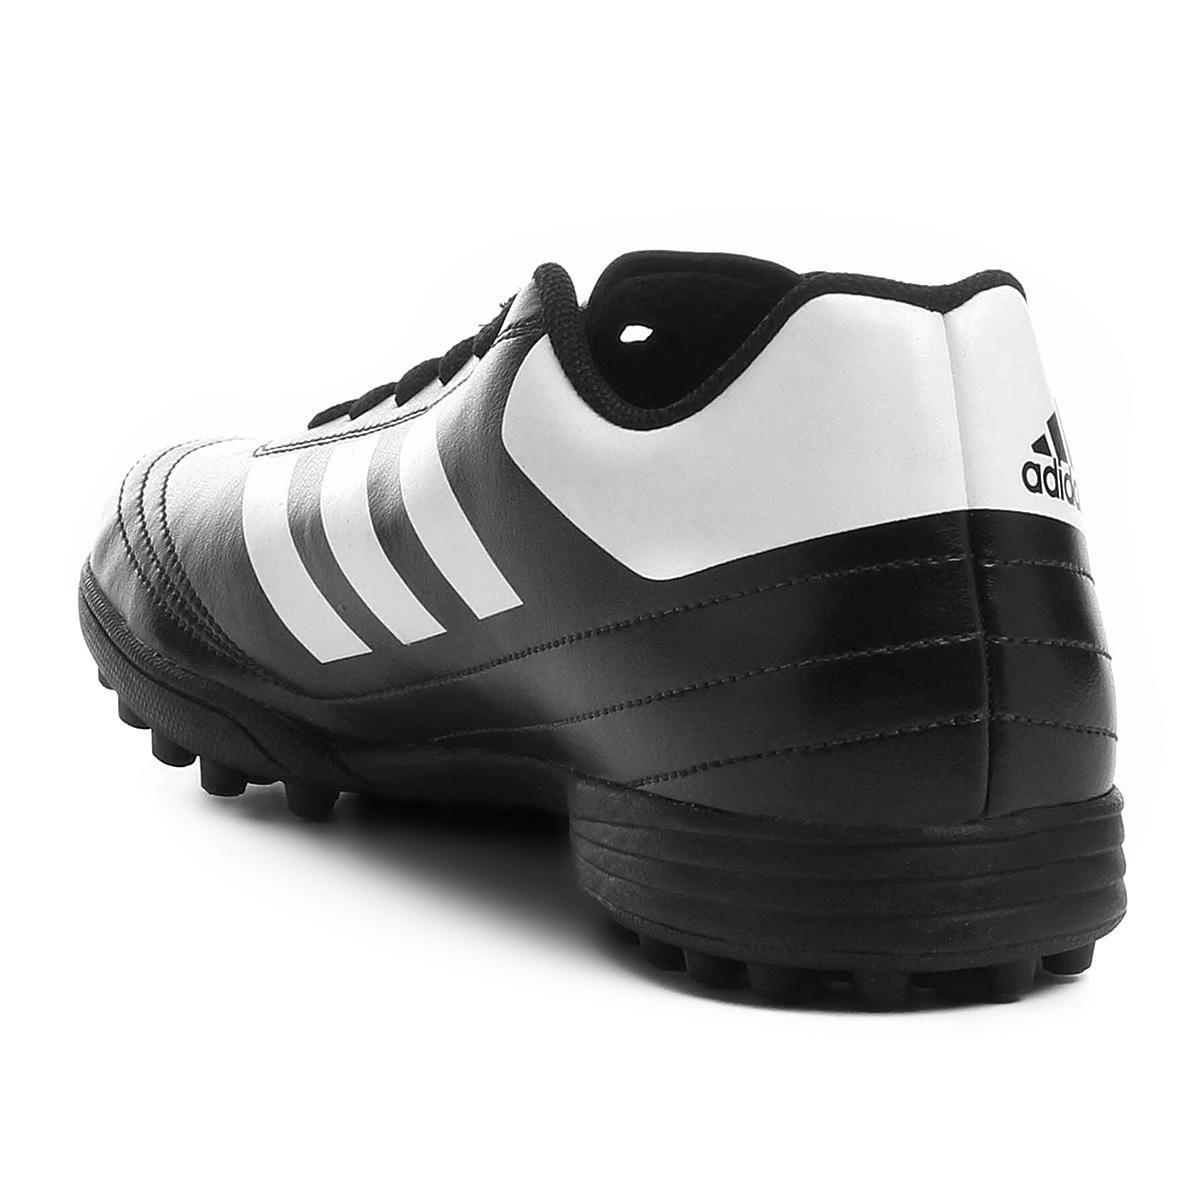 e2a3db382d ... Chuteira Society Goletto VI TF Adidas AQ4299 - Masculino - Preto   Branco ...